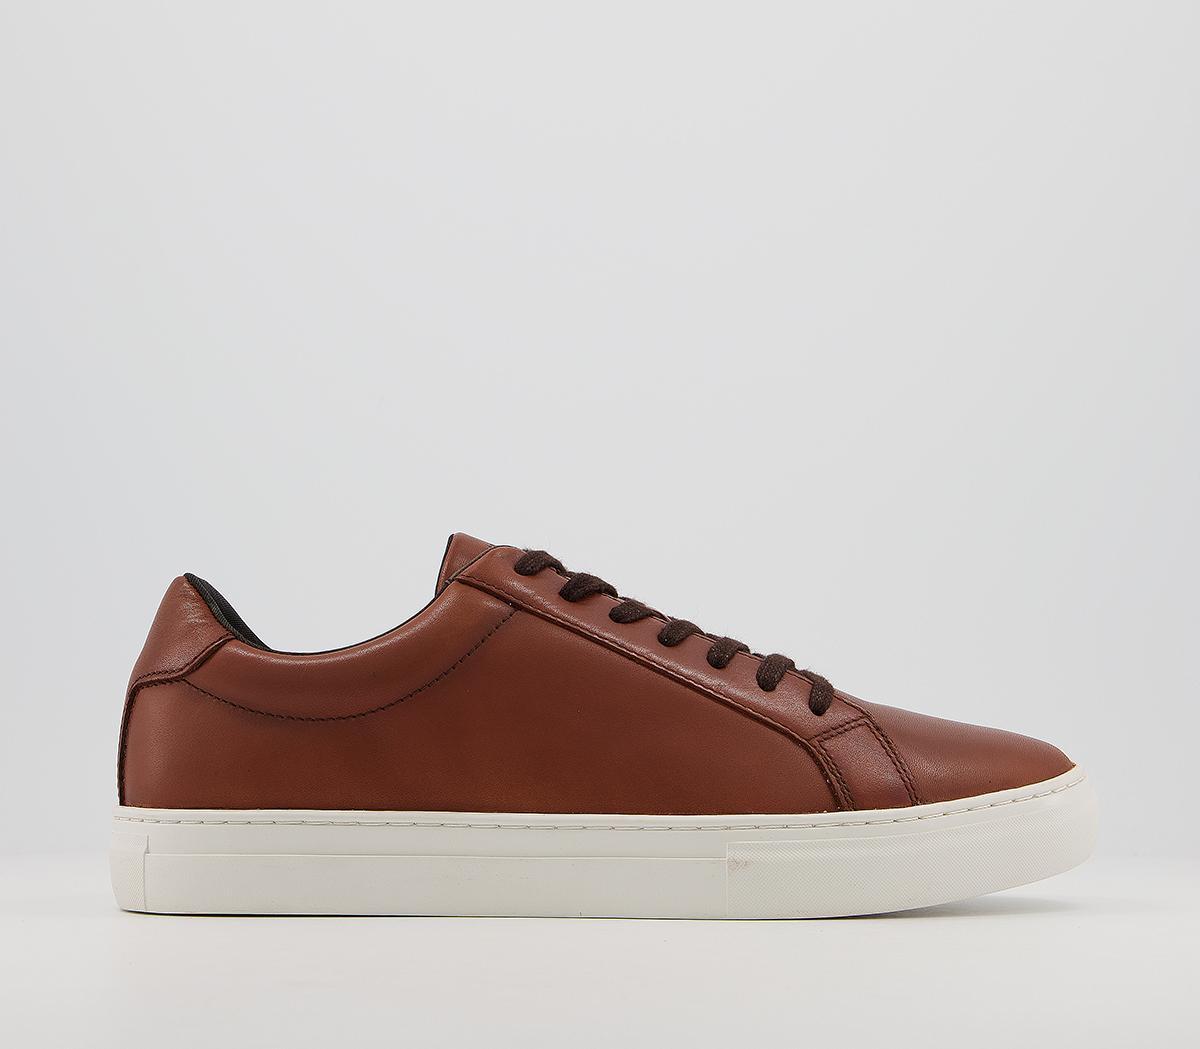 Vagabond Paul Sneakers Tan - His trainers